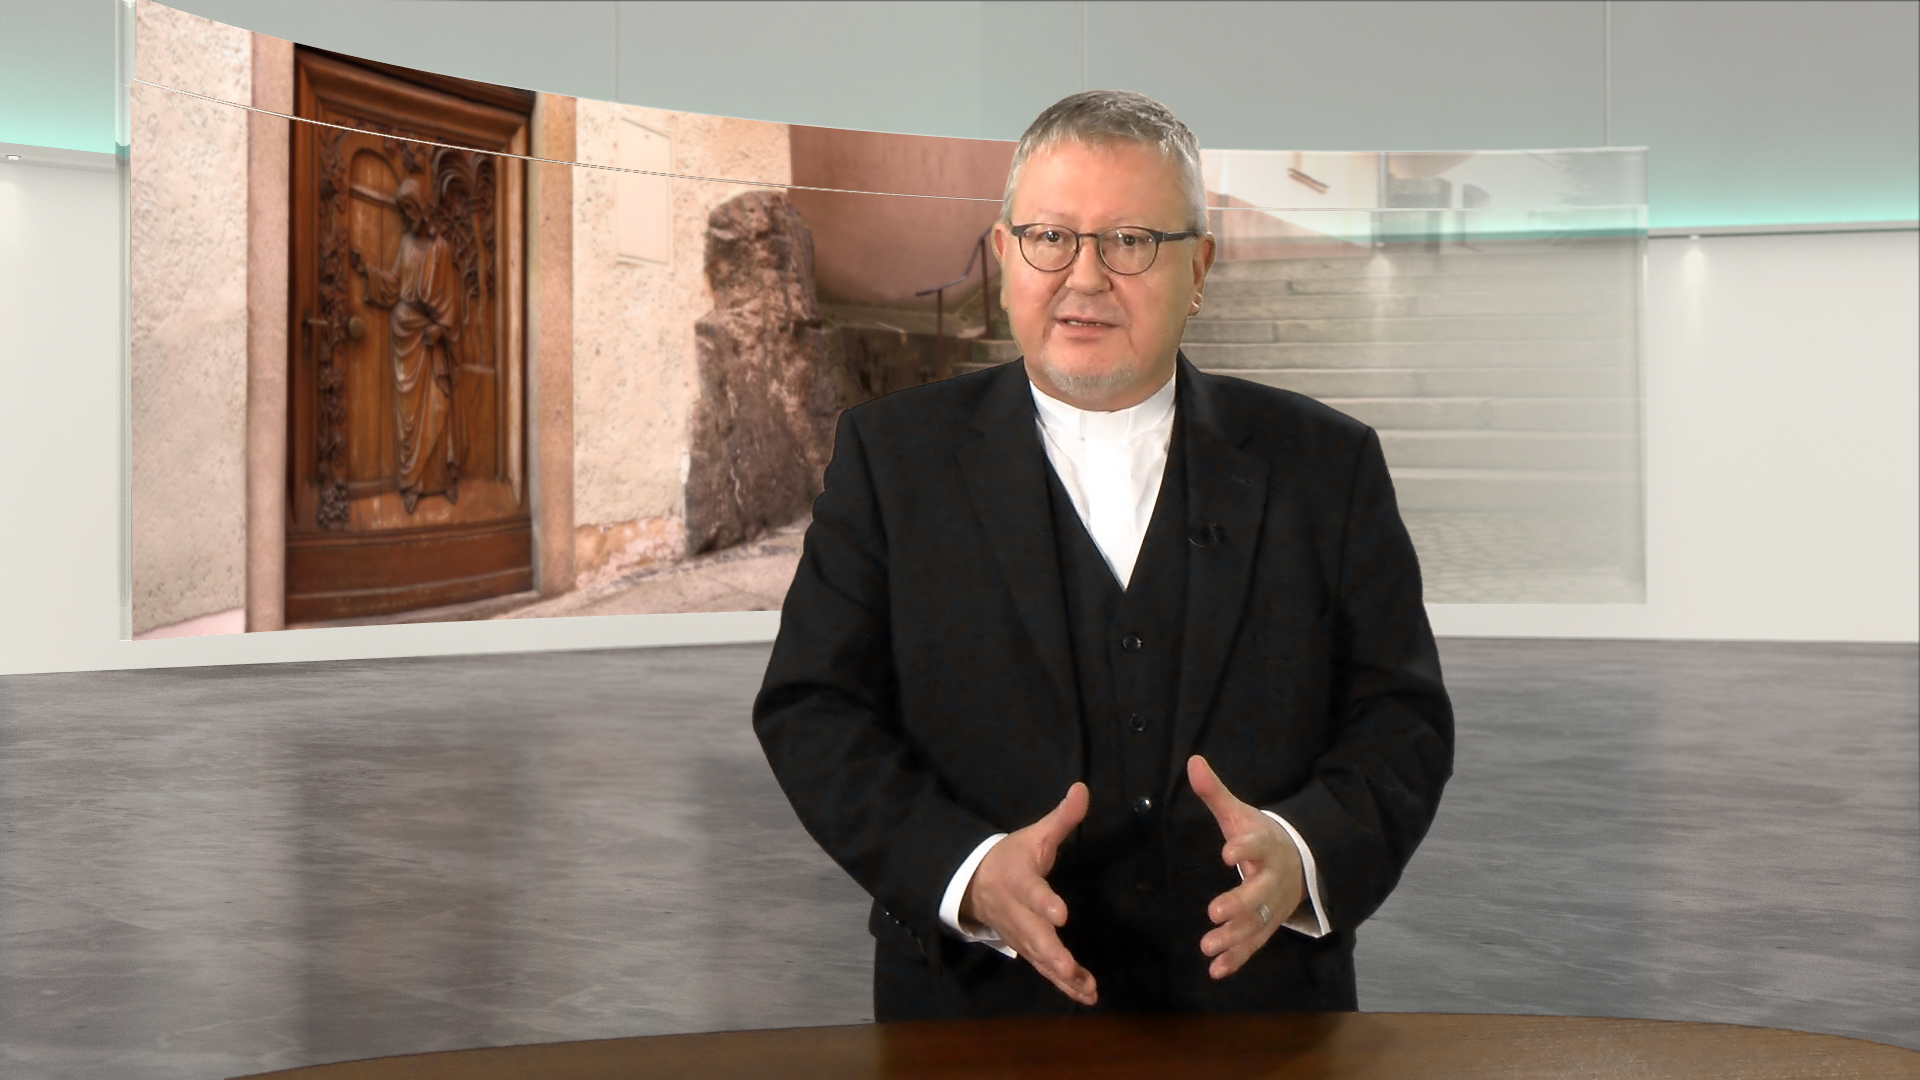 191215 Predigt Kirchgessner TV